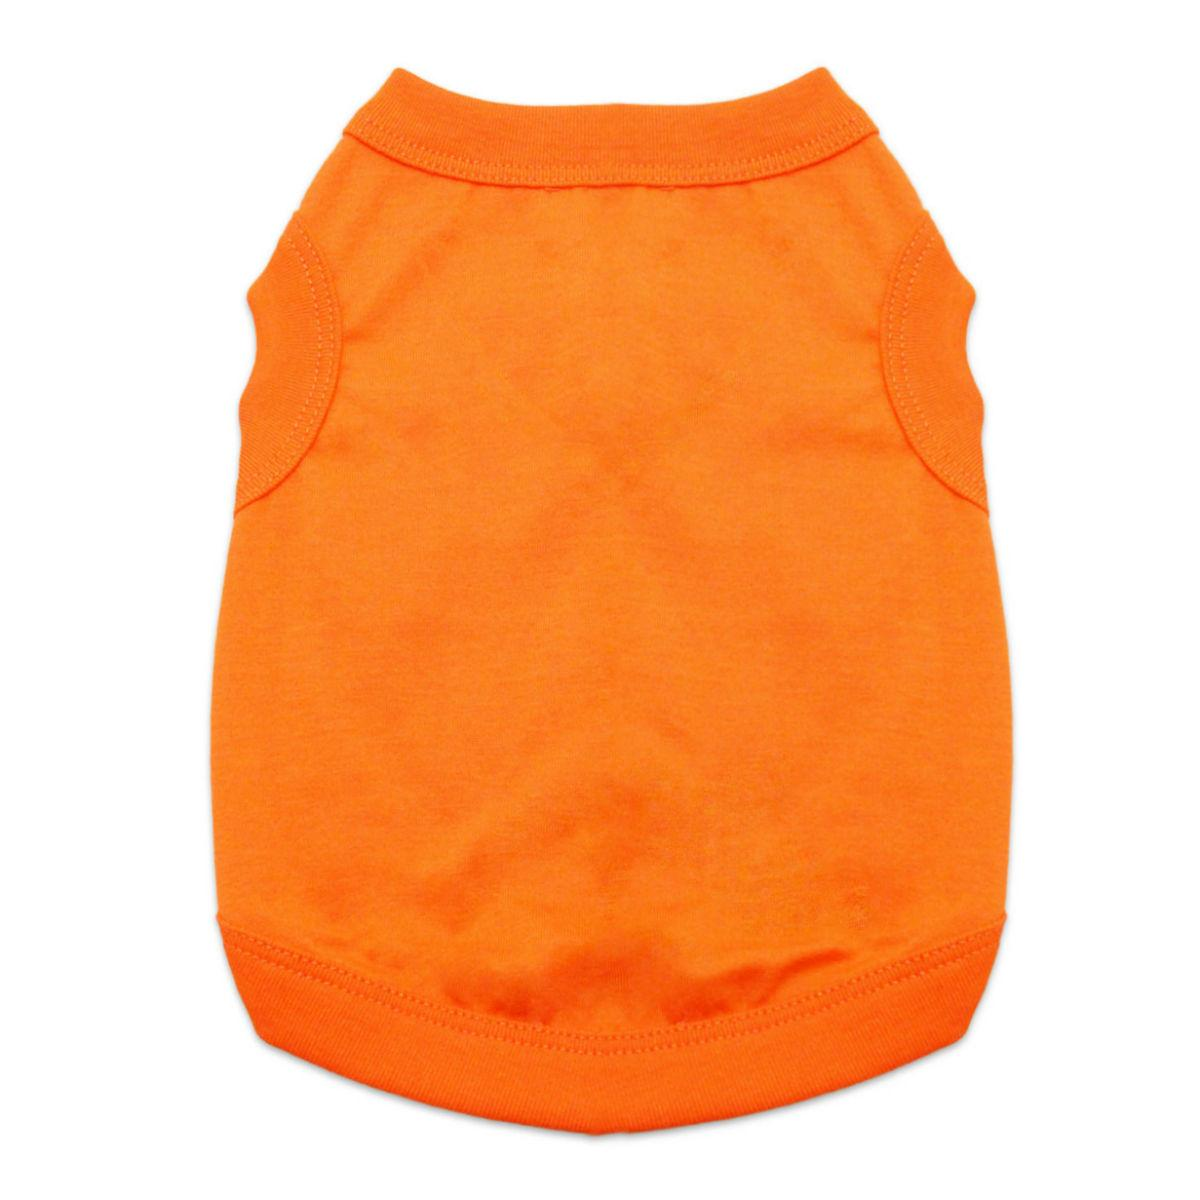 Cotton Dog Tank by Doggie Design - Sunset Orange